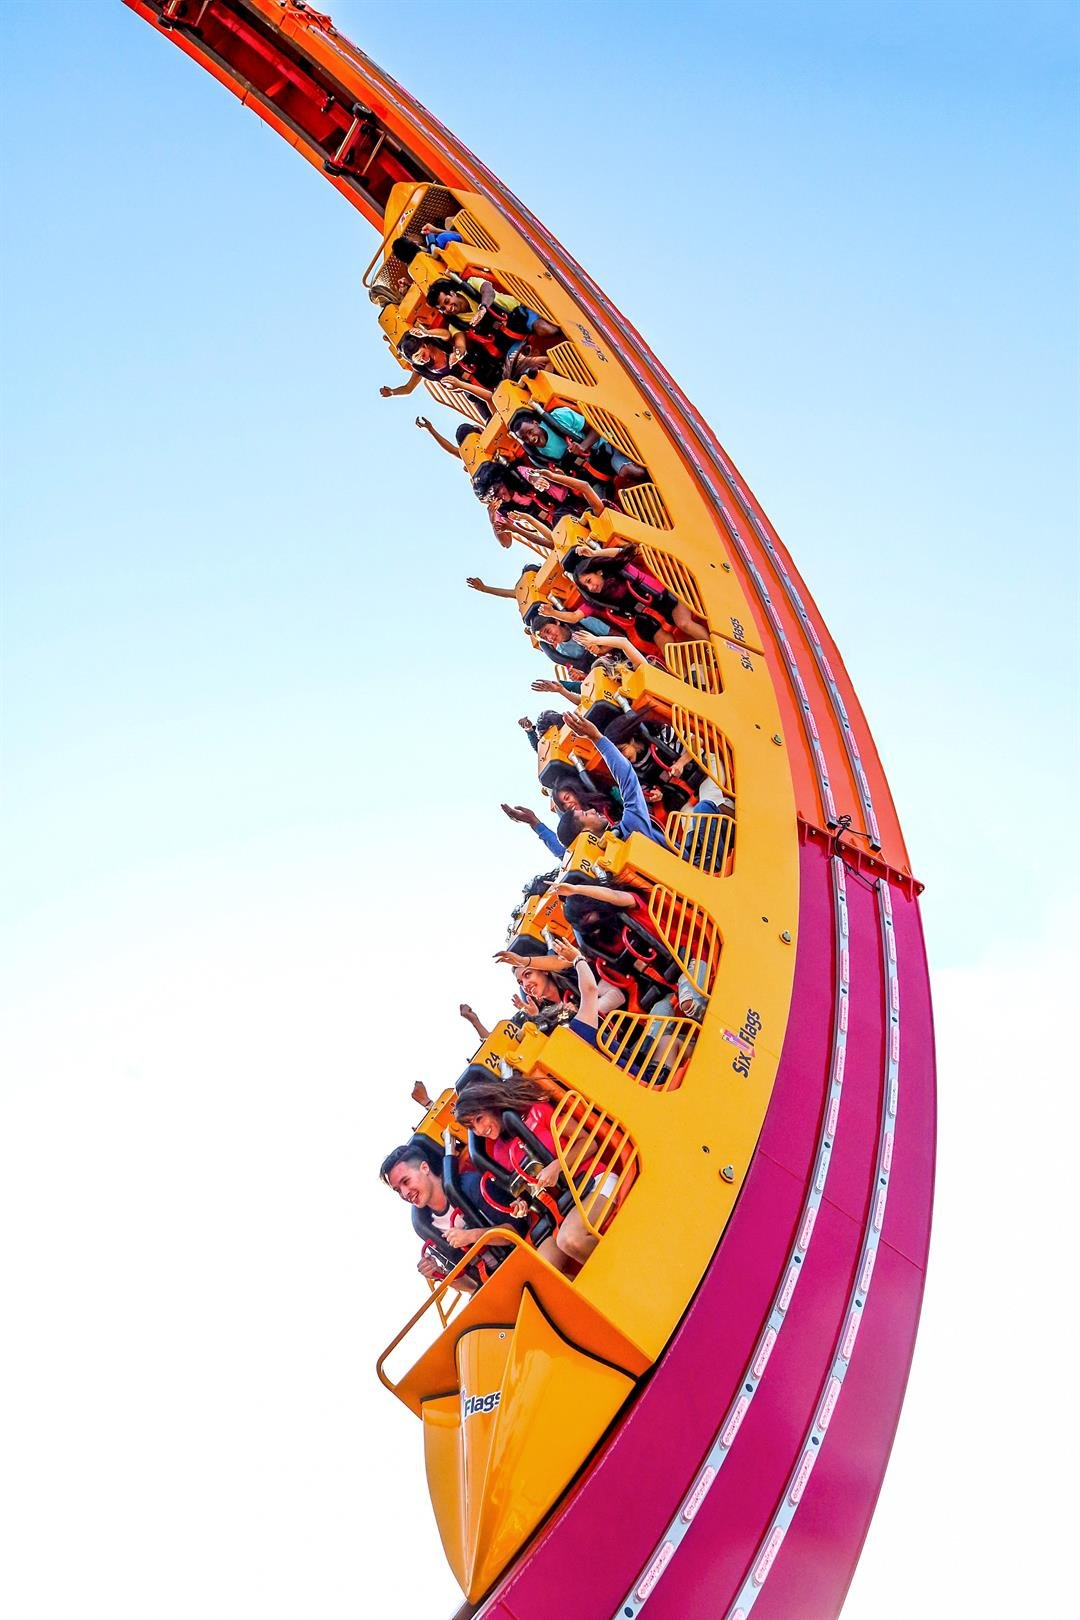 Source: Six Flags Entertainment Corporation